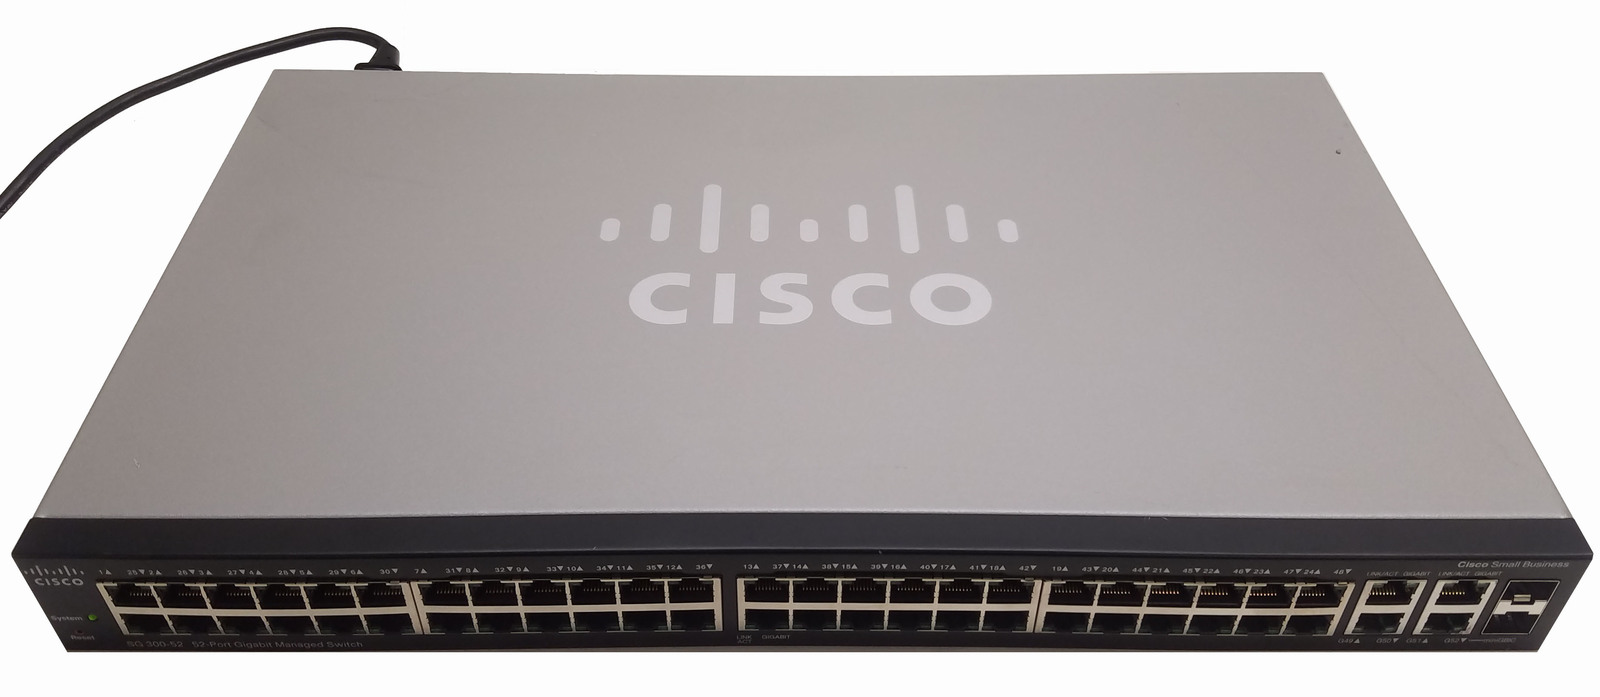 Cisco SG300-52 Small Business 52 Port Gigabit Managed Switch Bin:1